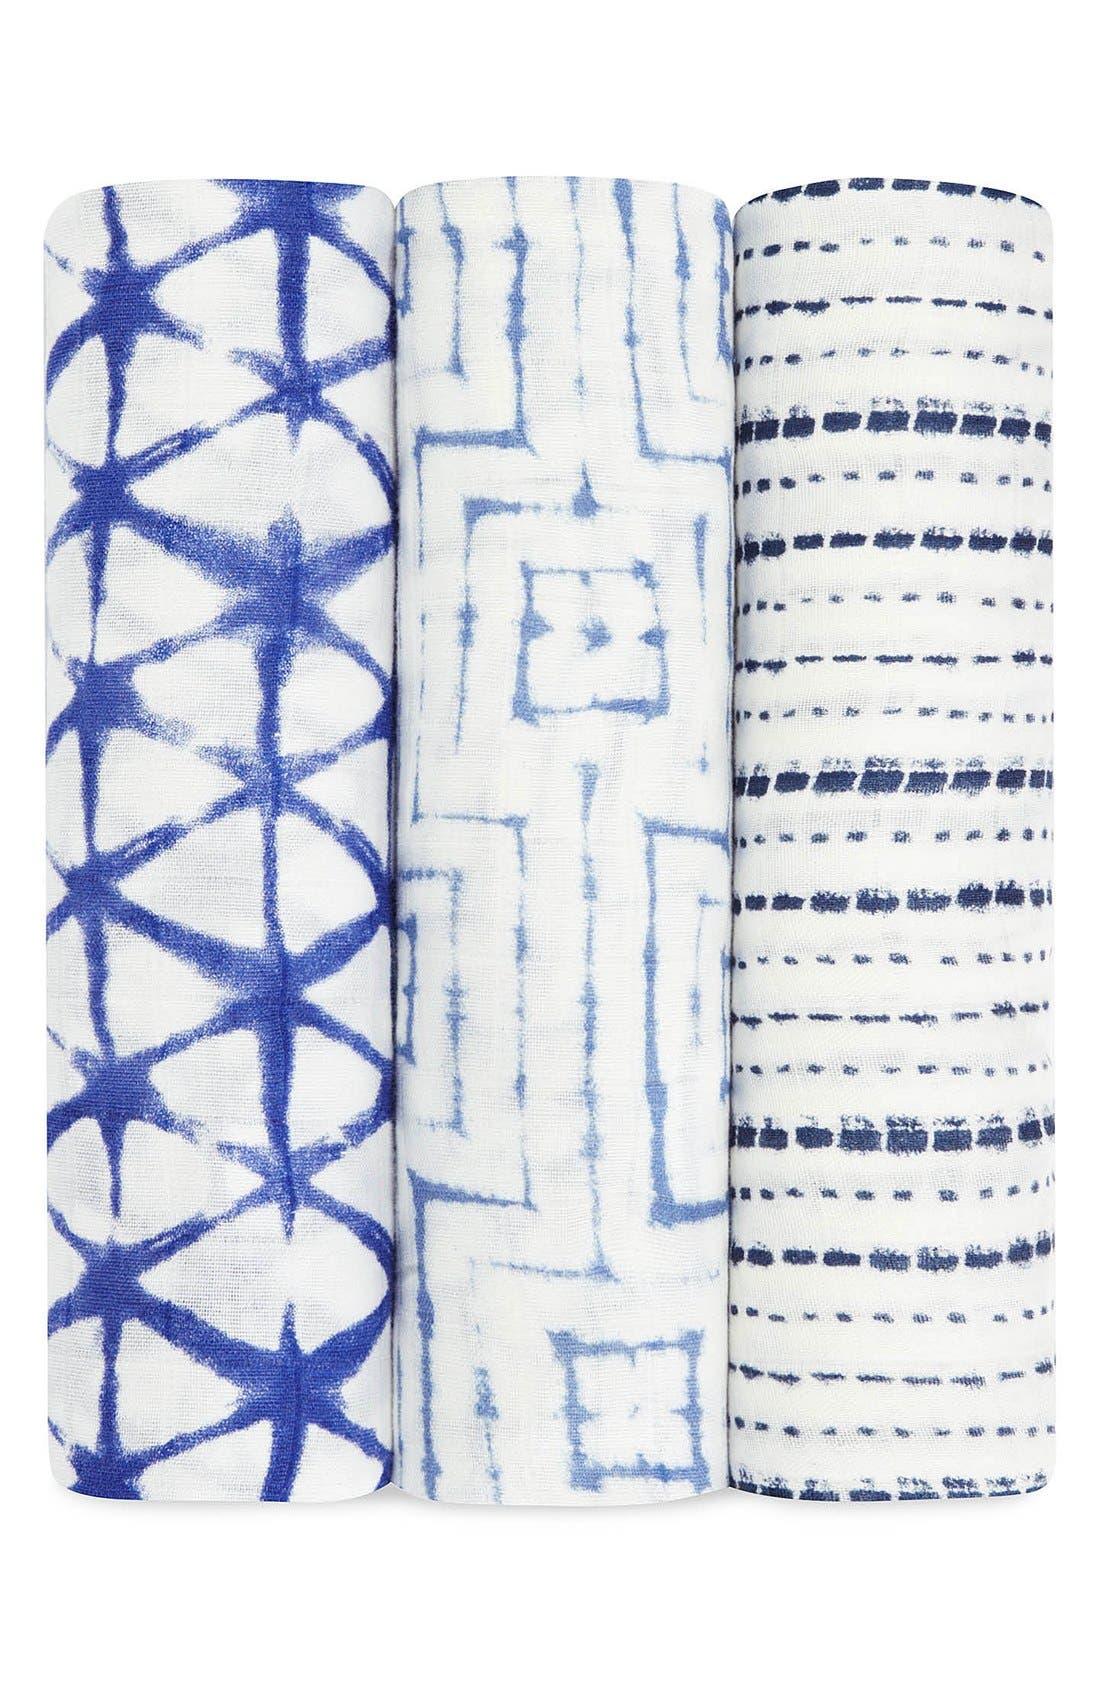 'Silky Soft' Swaddling Cloths,                             Main thumbnail 1, color,                             Blue